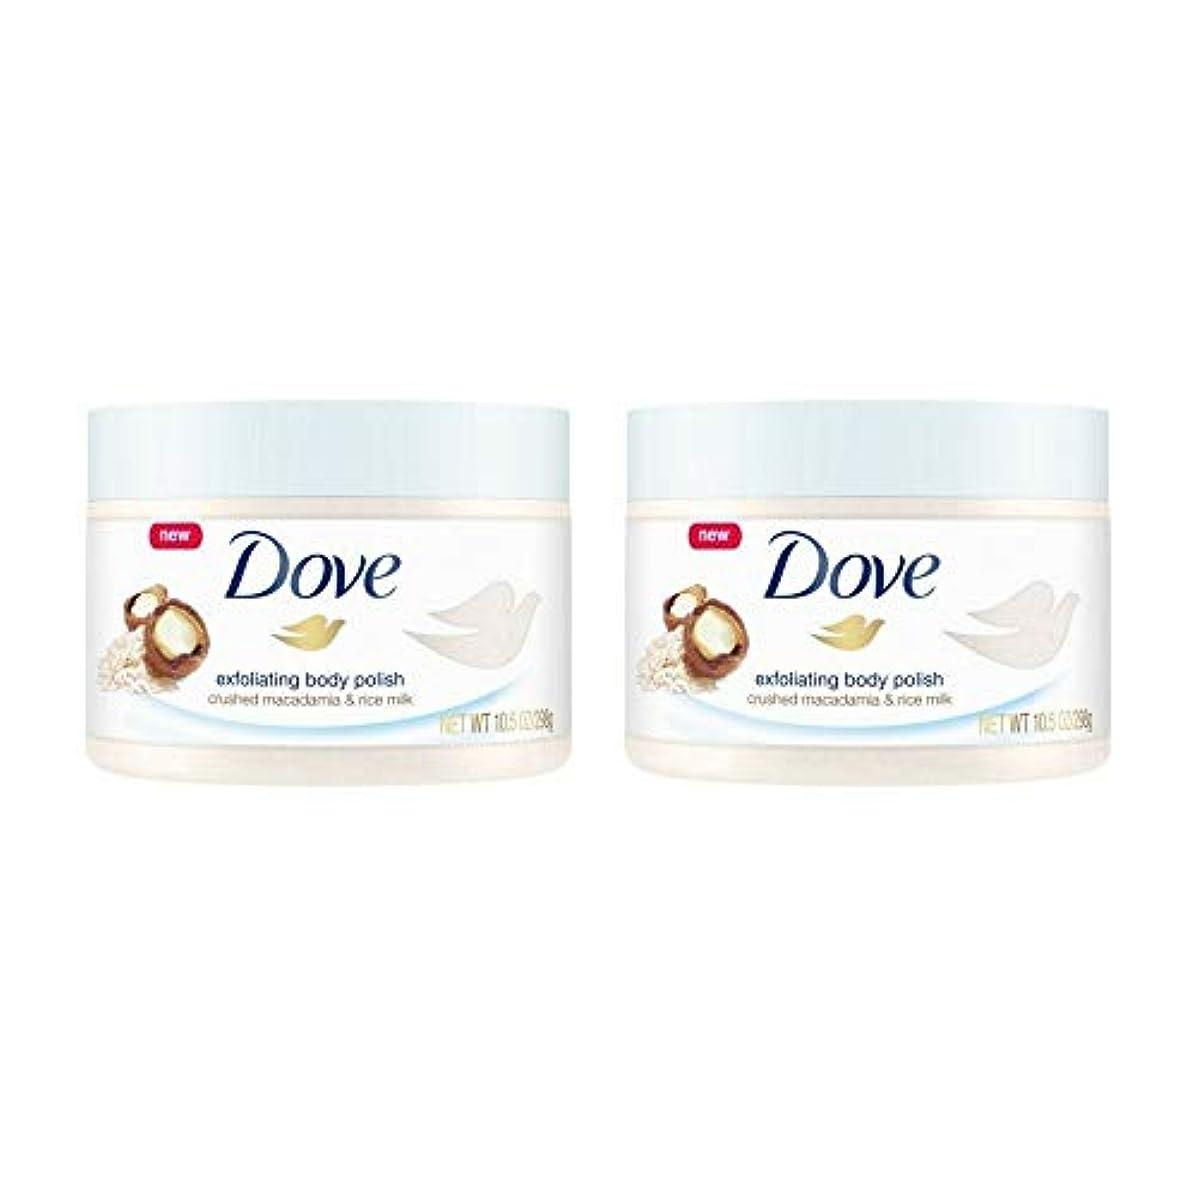 神社適度な博覧会Dove Exfoliating Body Polish Body Scrub Macadamia & Rice Milk 10.5 oz (2 pack) 141[並行輸入]